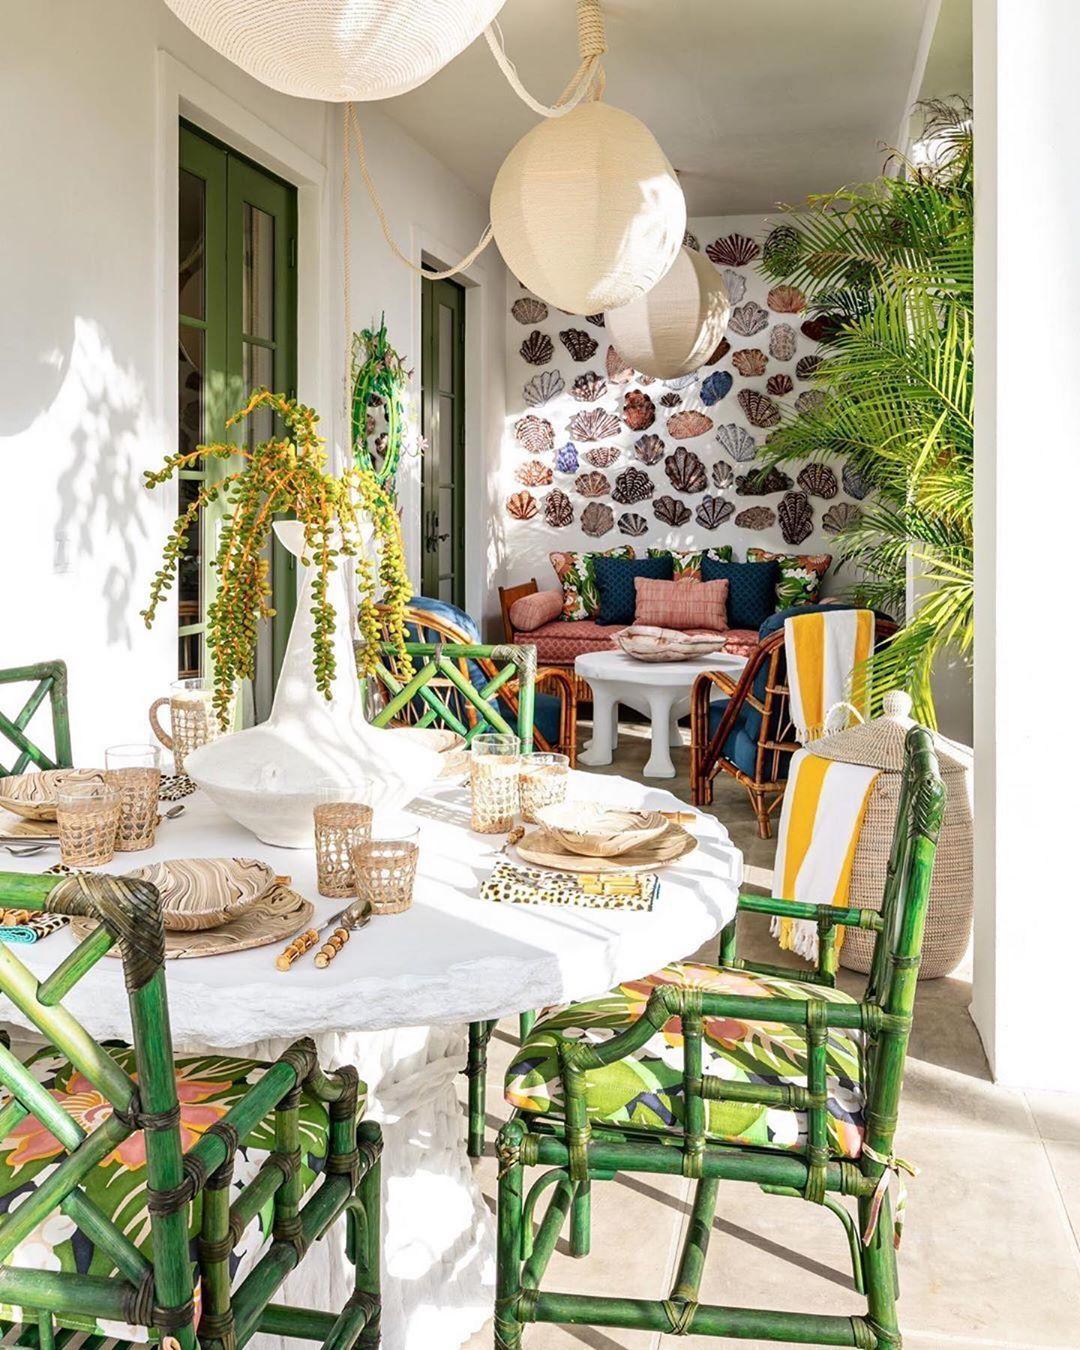 30 Best Outdoor Patio Design Ideas 2020 Outdoor Patio Designs